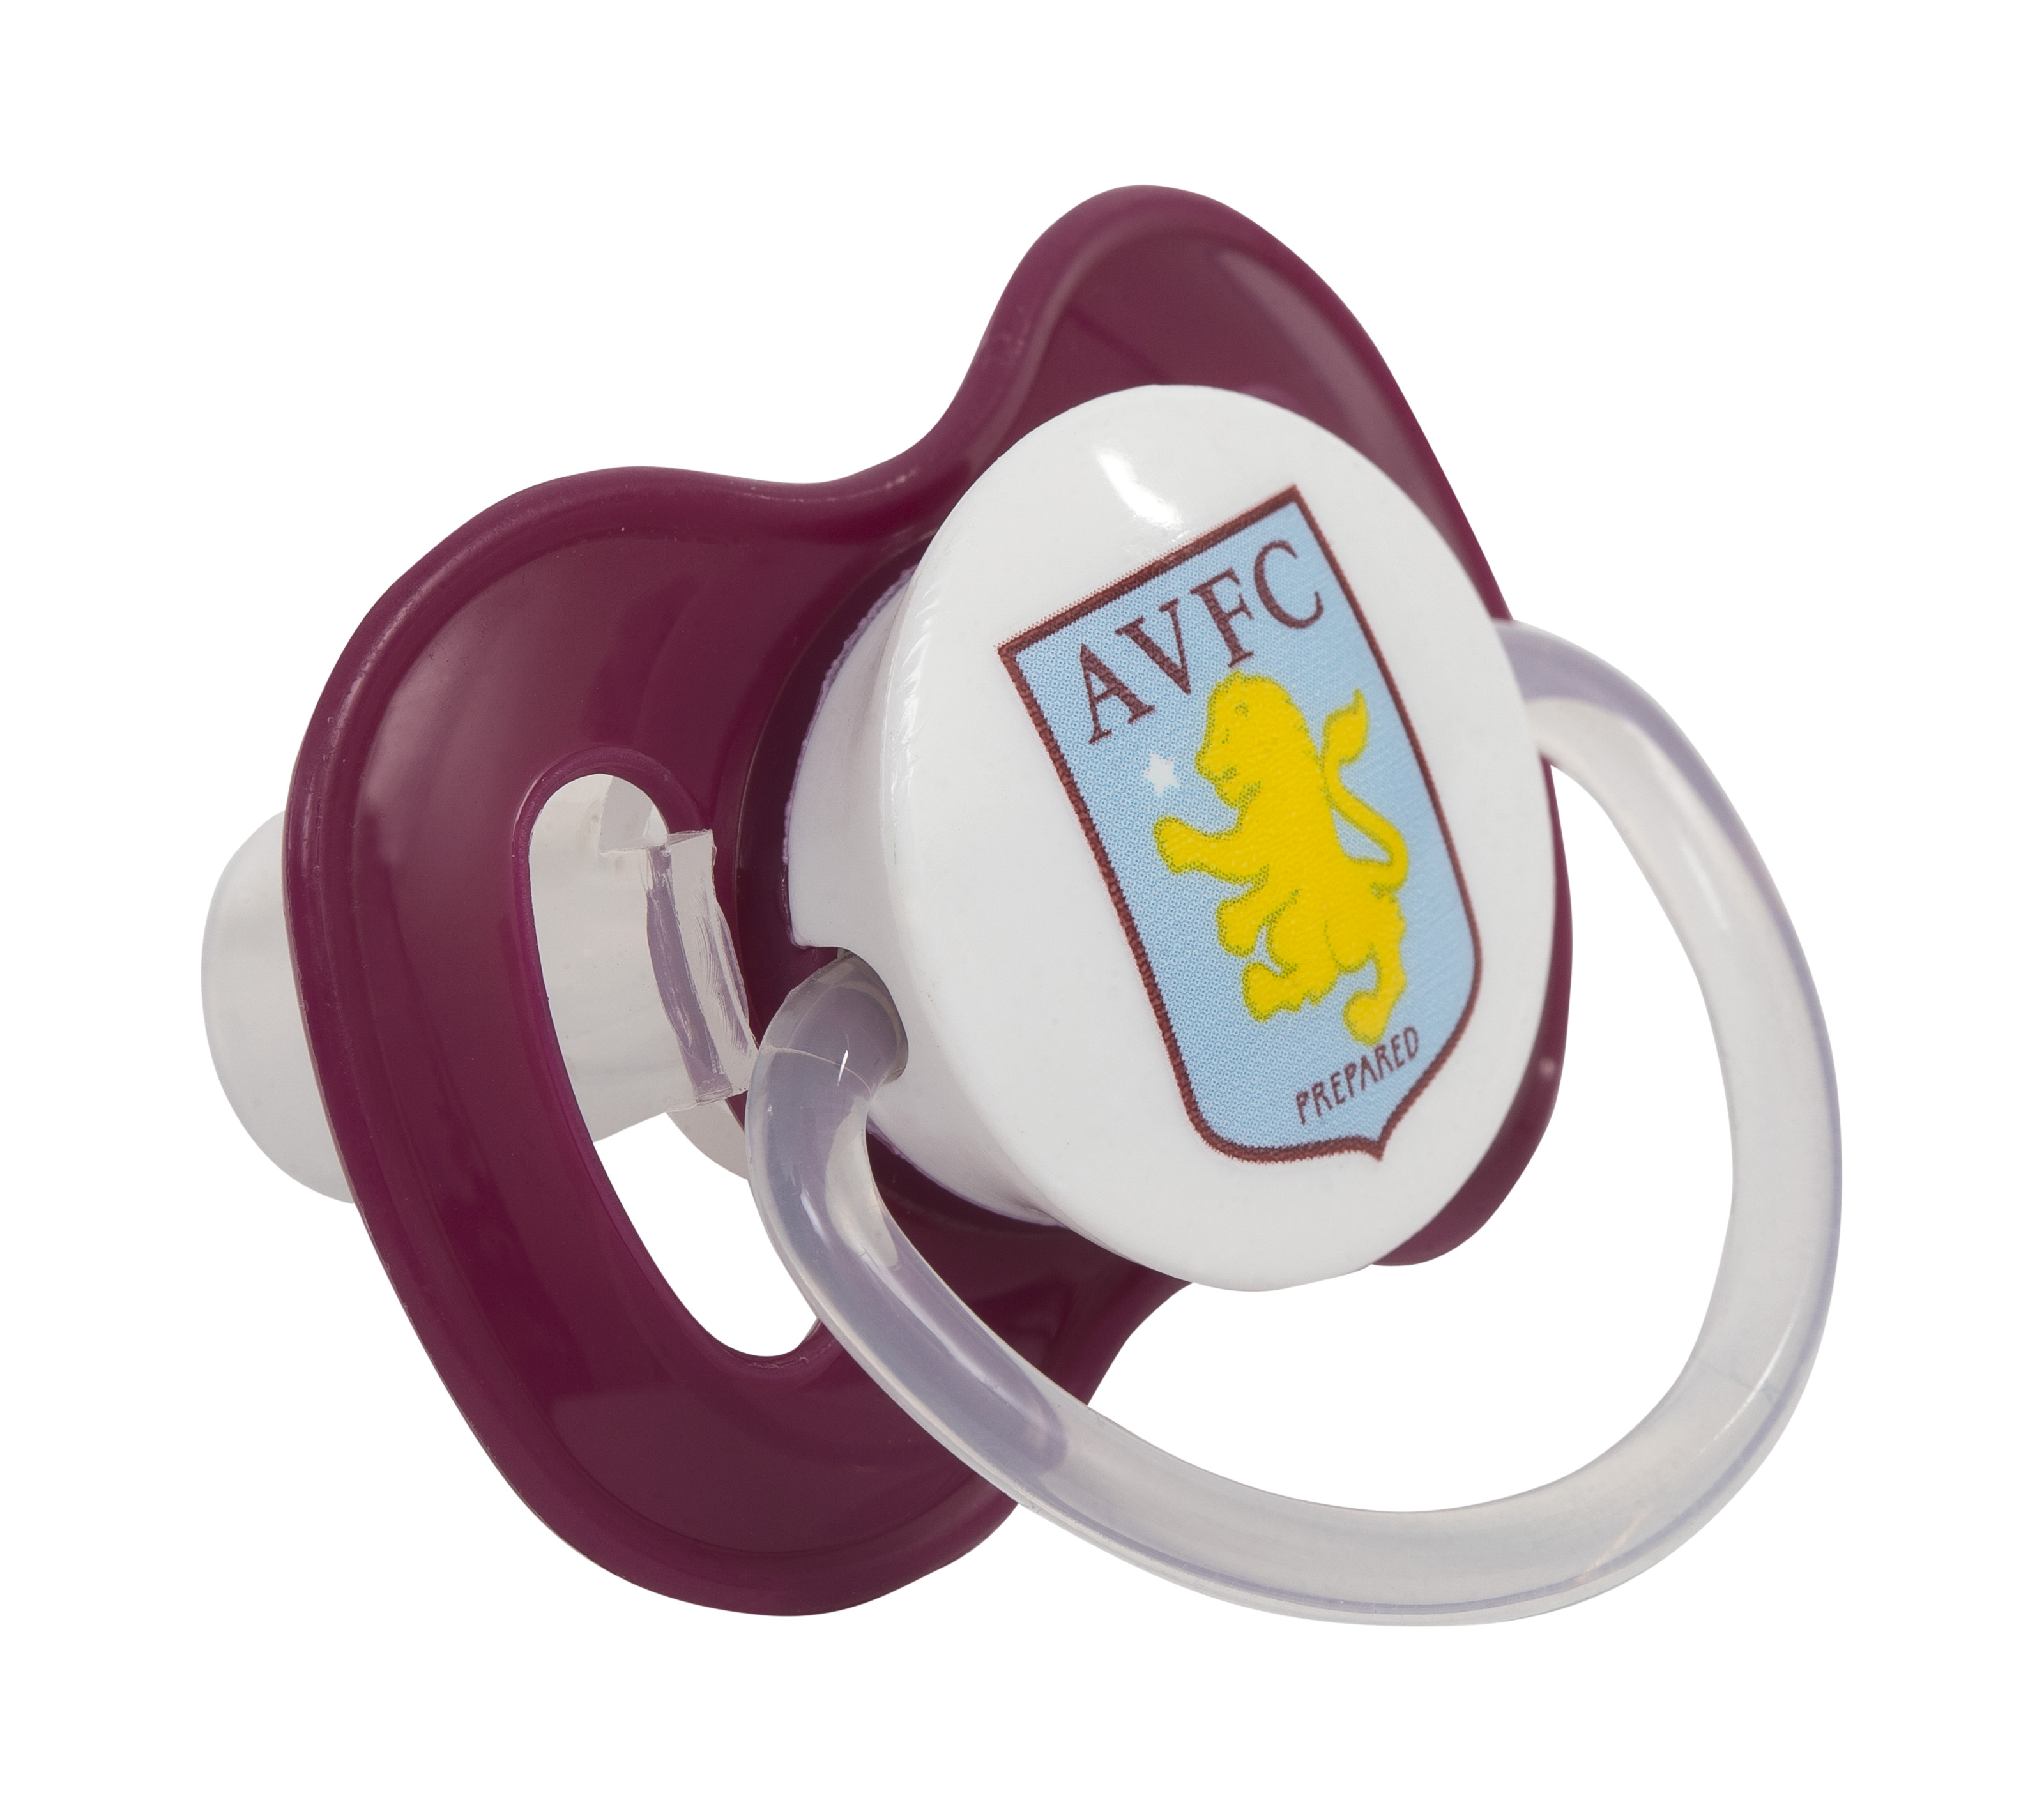 Royal Baby Merchandise at Aston Villa